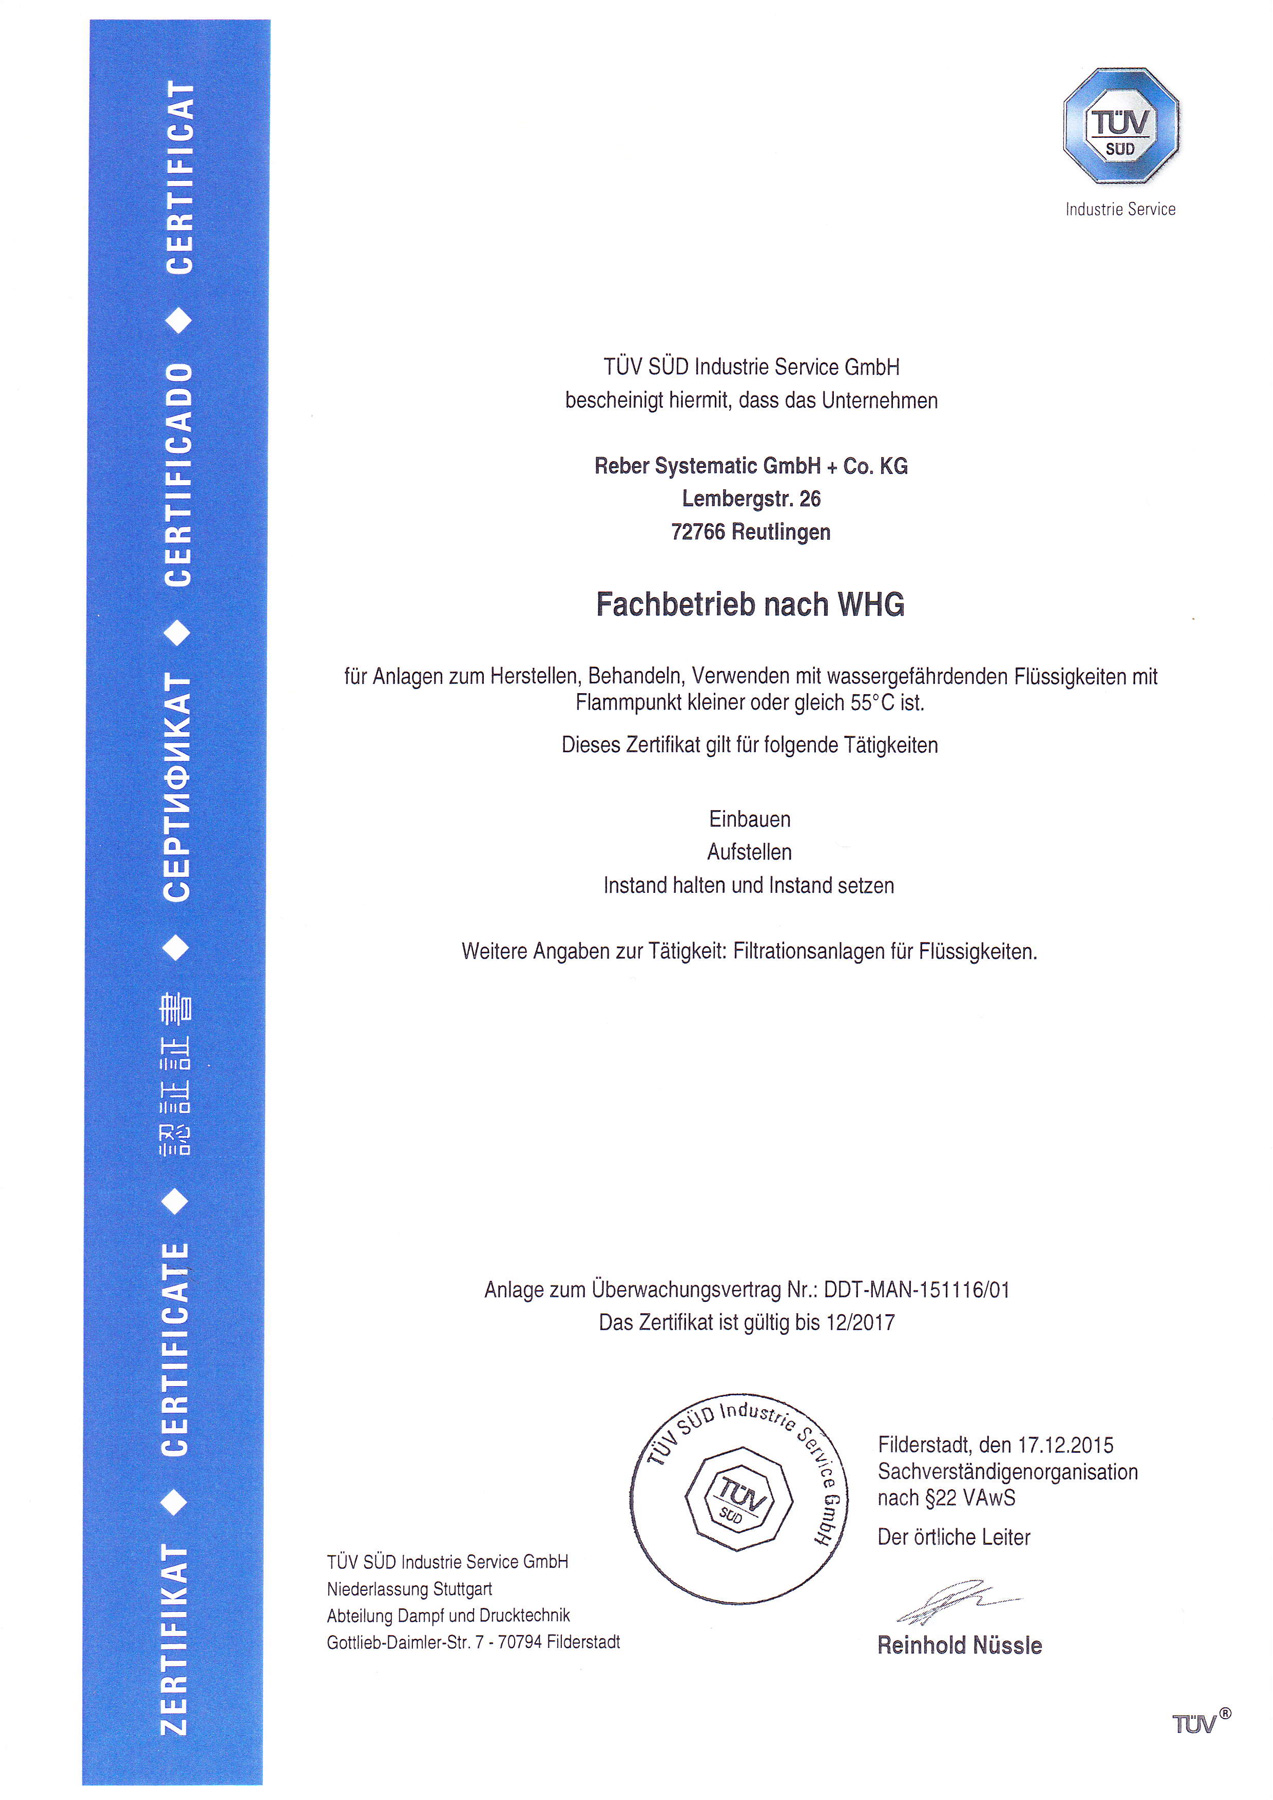 awards certificate - Ideal.vistalist.co